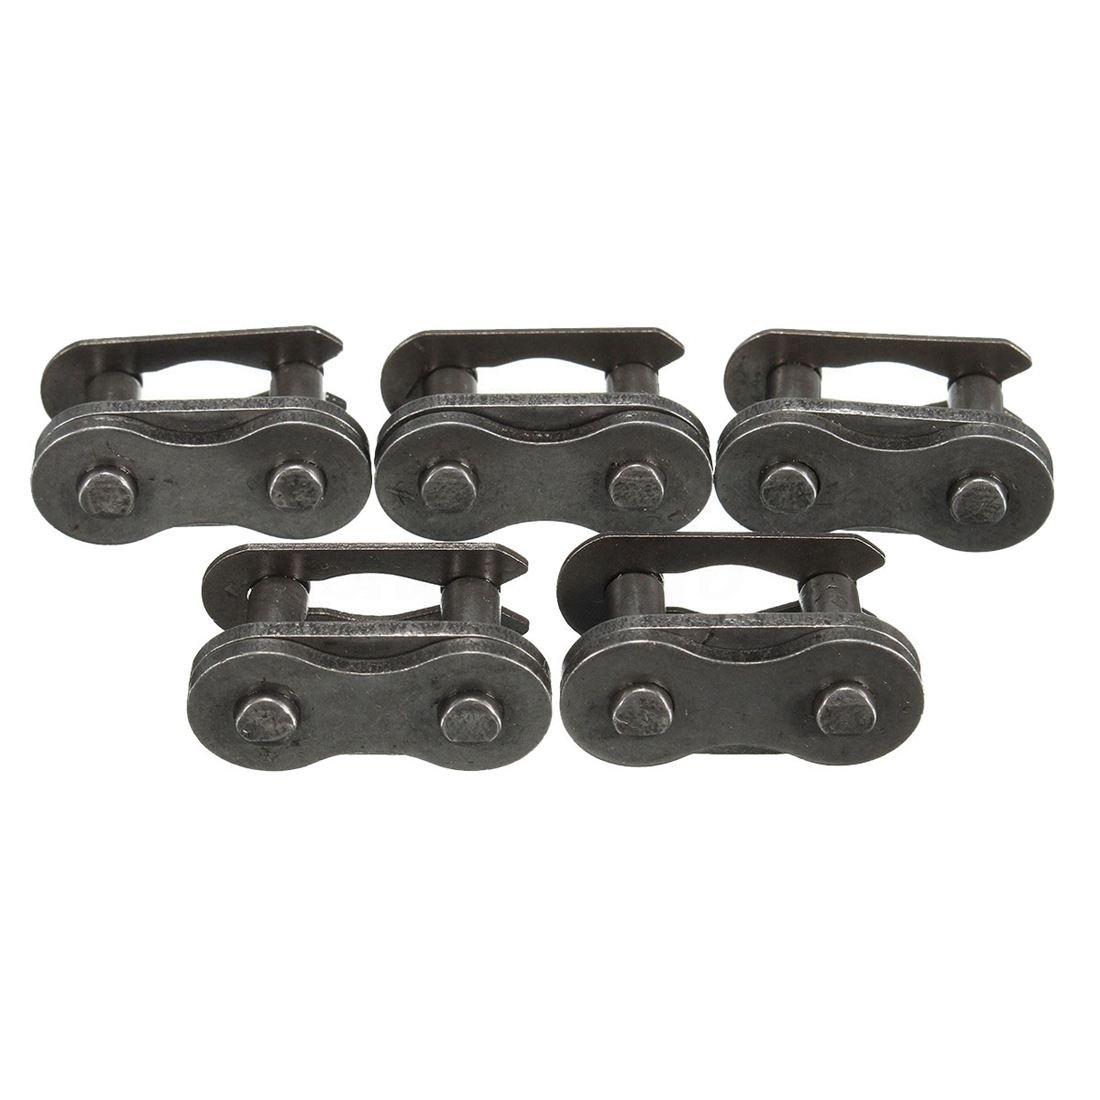 SODIAL(R) 5 Sets 415 Chain Master Link 80cc 2-Stroke Motorized Bike GAS ENGINE Parts